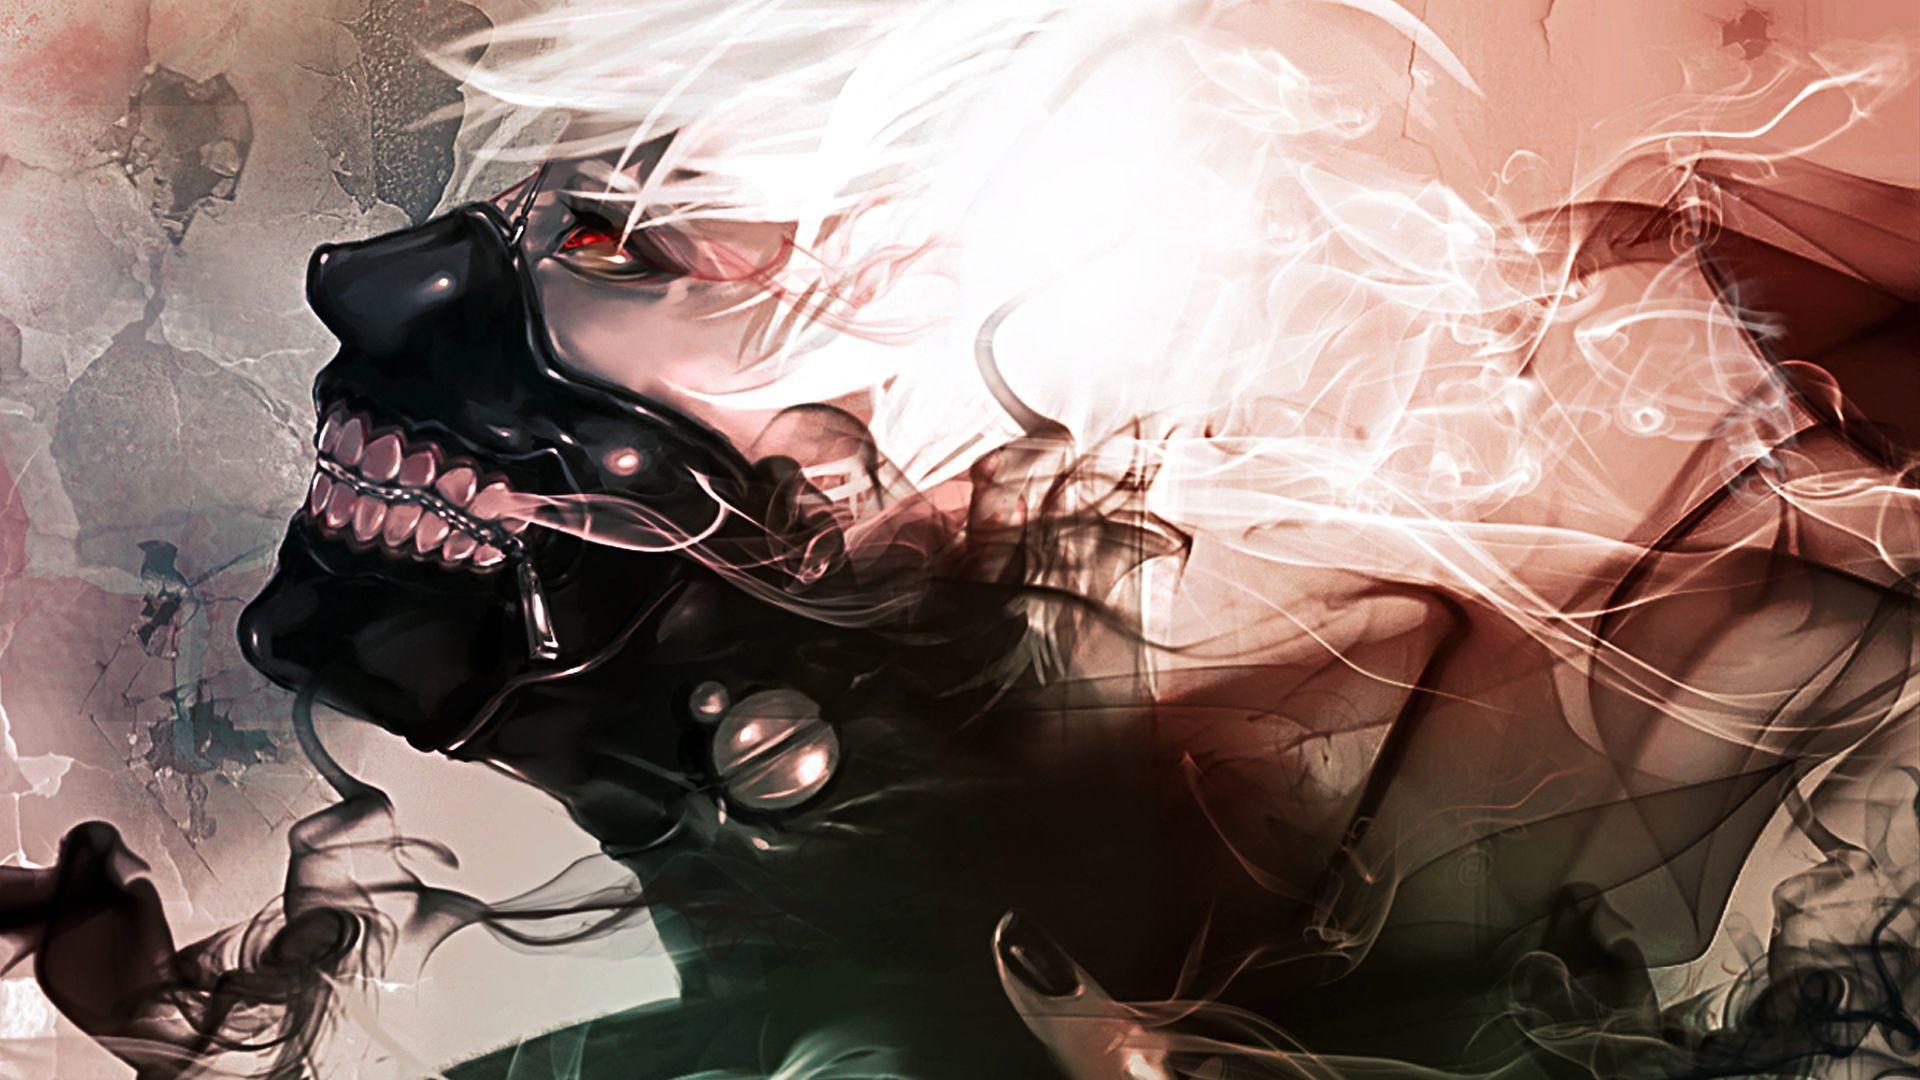 tokyo-ghoul-season-3-pushed-back-again-929146.jpg (1920×1080) | Tokyo Ghoul  | Pinterest | Tokyo ghoul and Tokyo